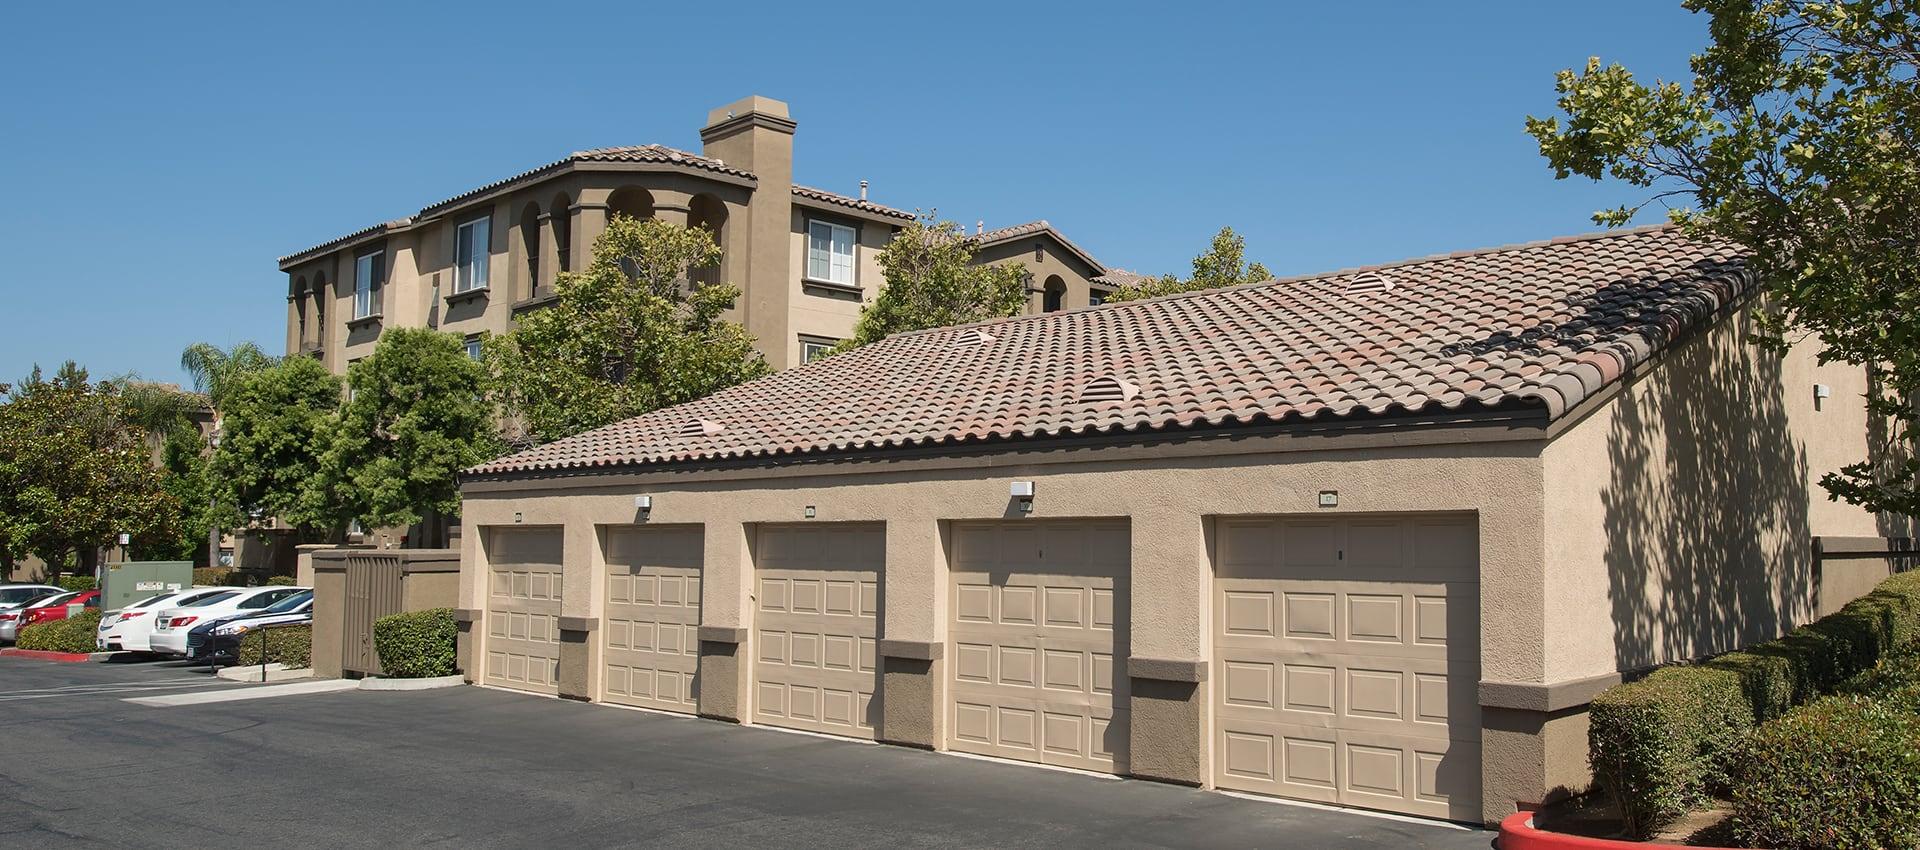 Exterior of garages at Esplanade Apartment Homes in Riverside California